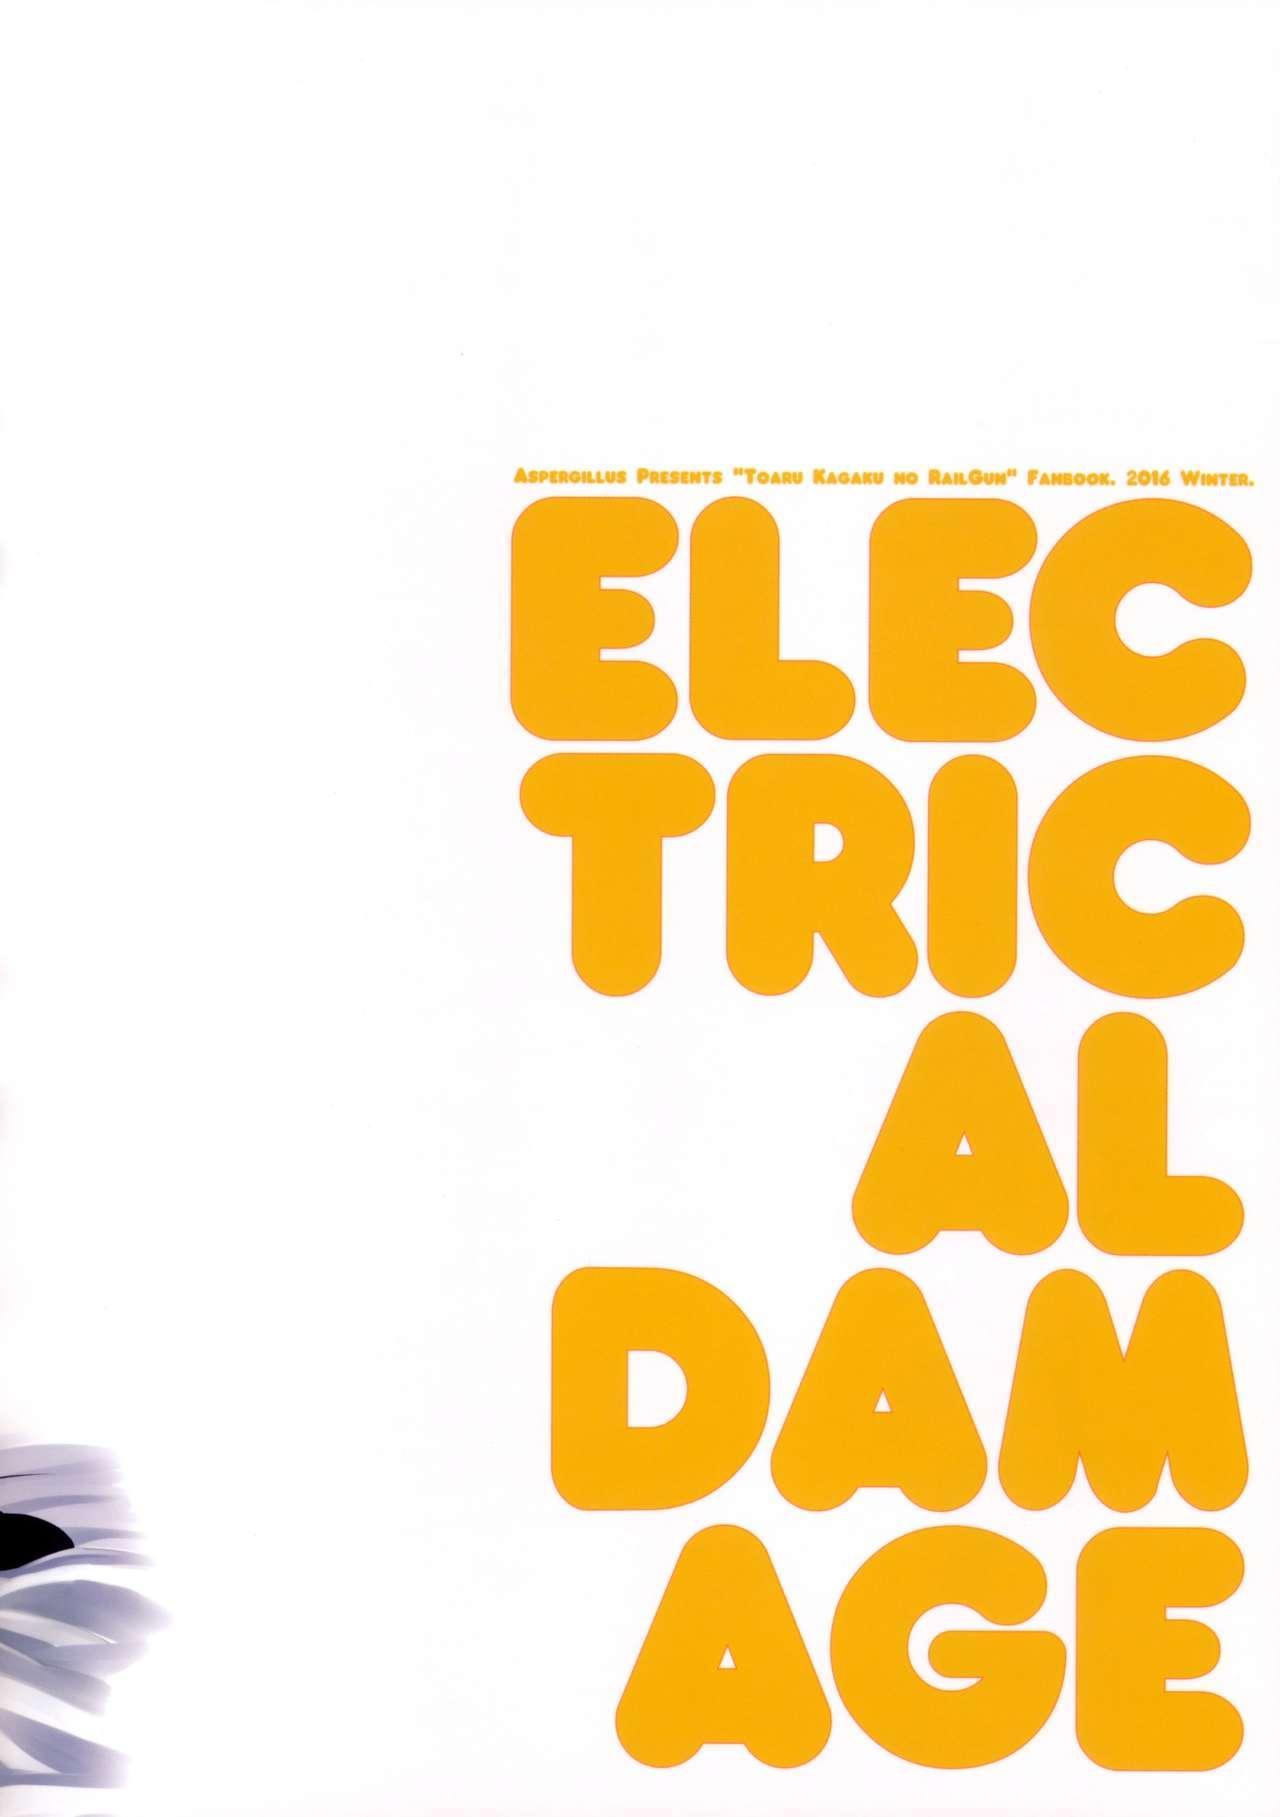 ELECTRICAL DAMAGE 25